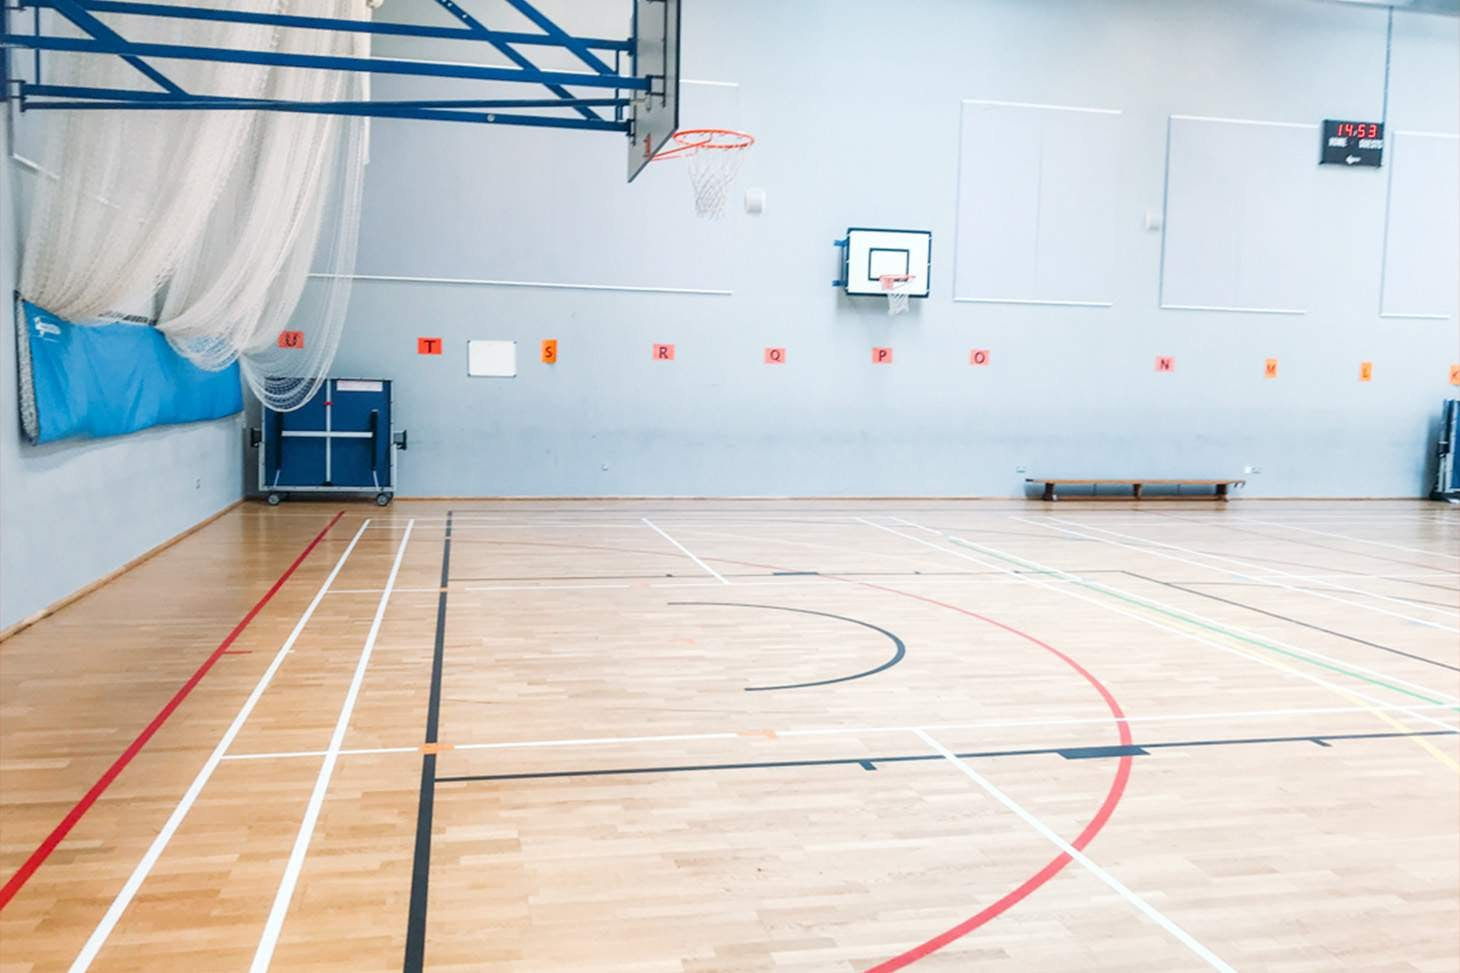 St Paul's Way Trust School Court | Sports hall volleyball court